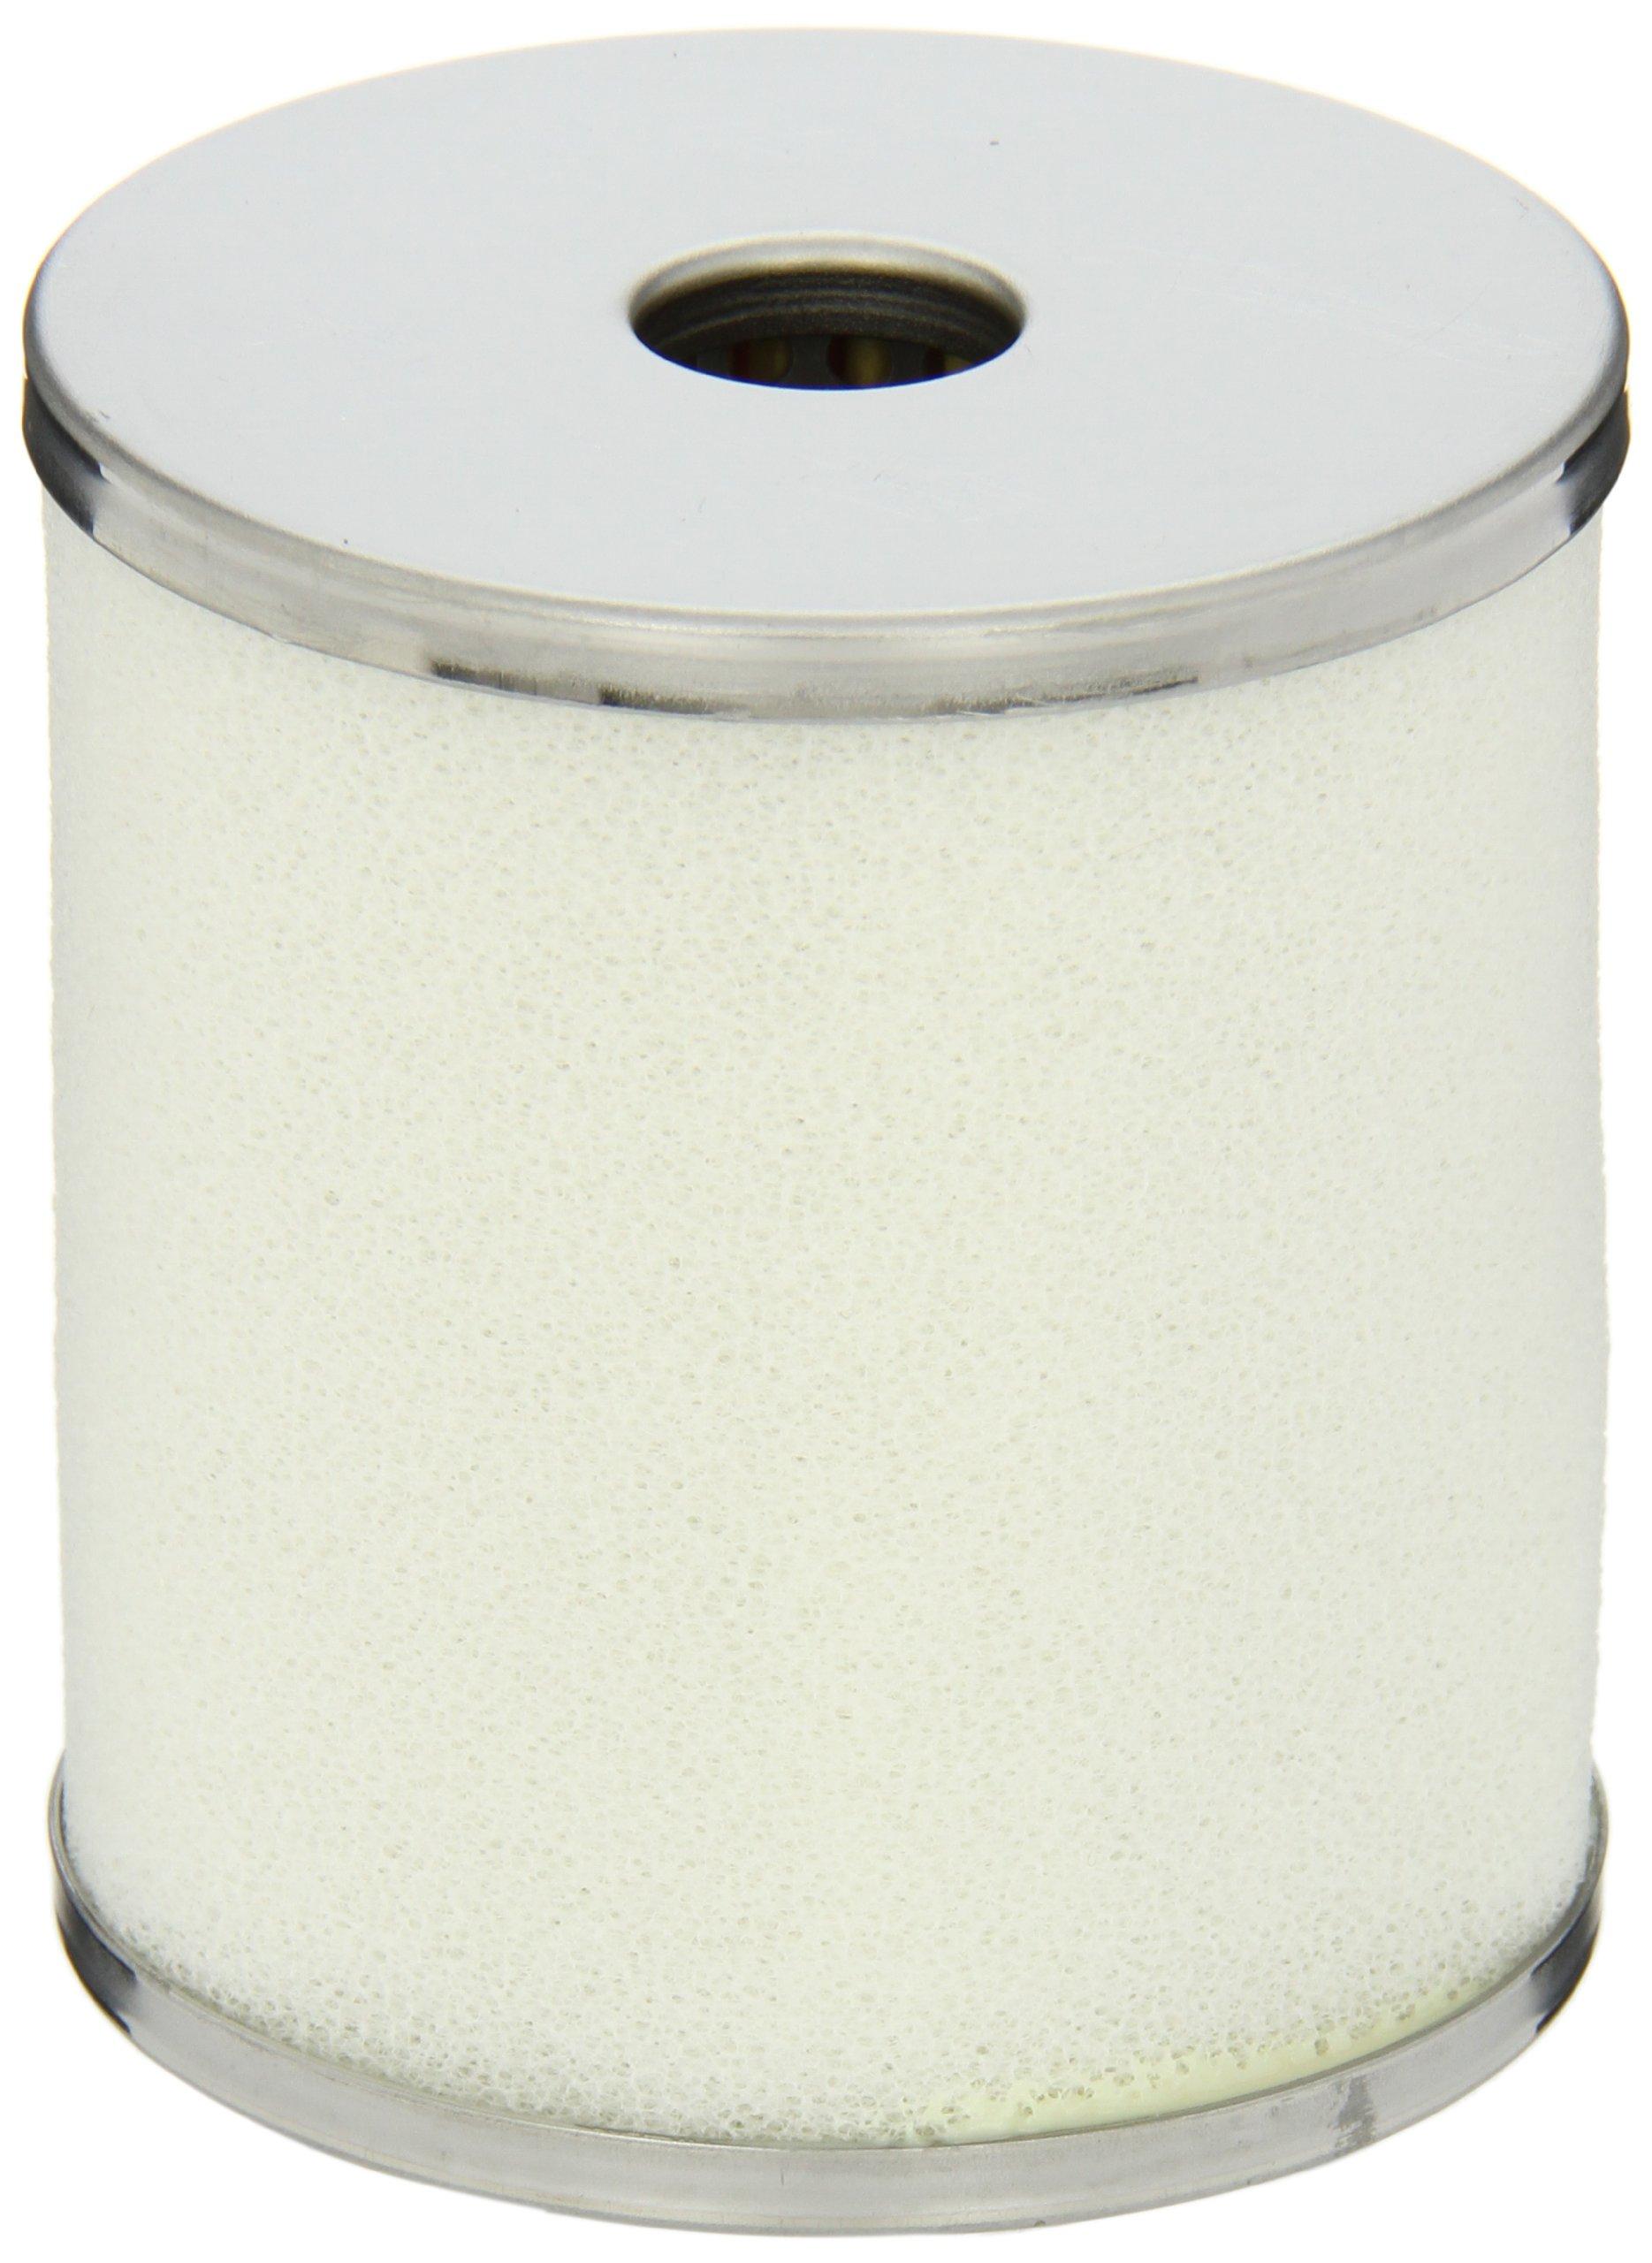 SMC AM-EL350 Mist Separator Filter Element for AM350, 0.3 micron by SMC